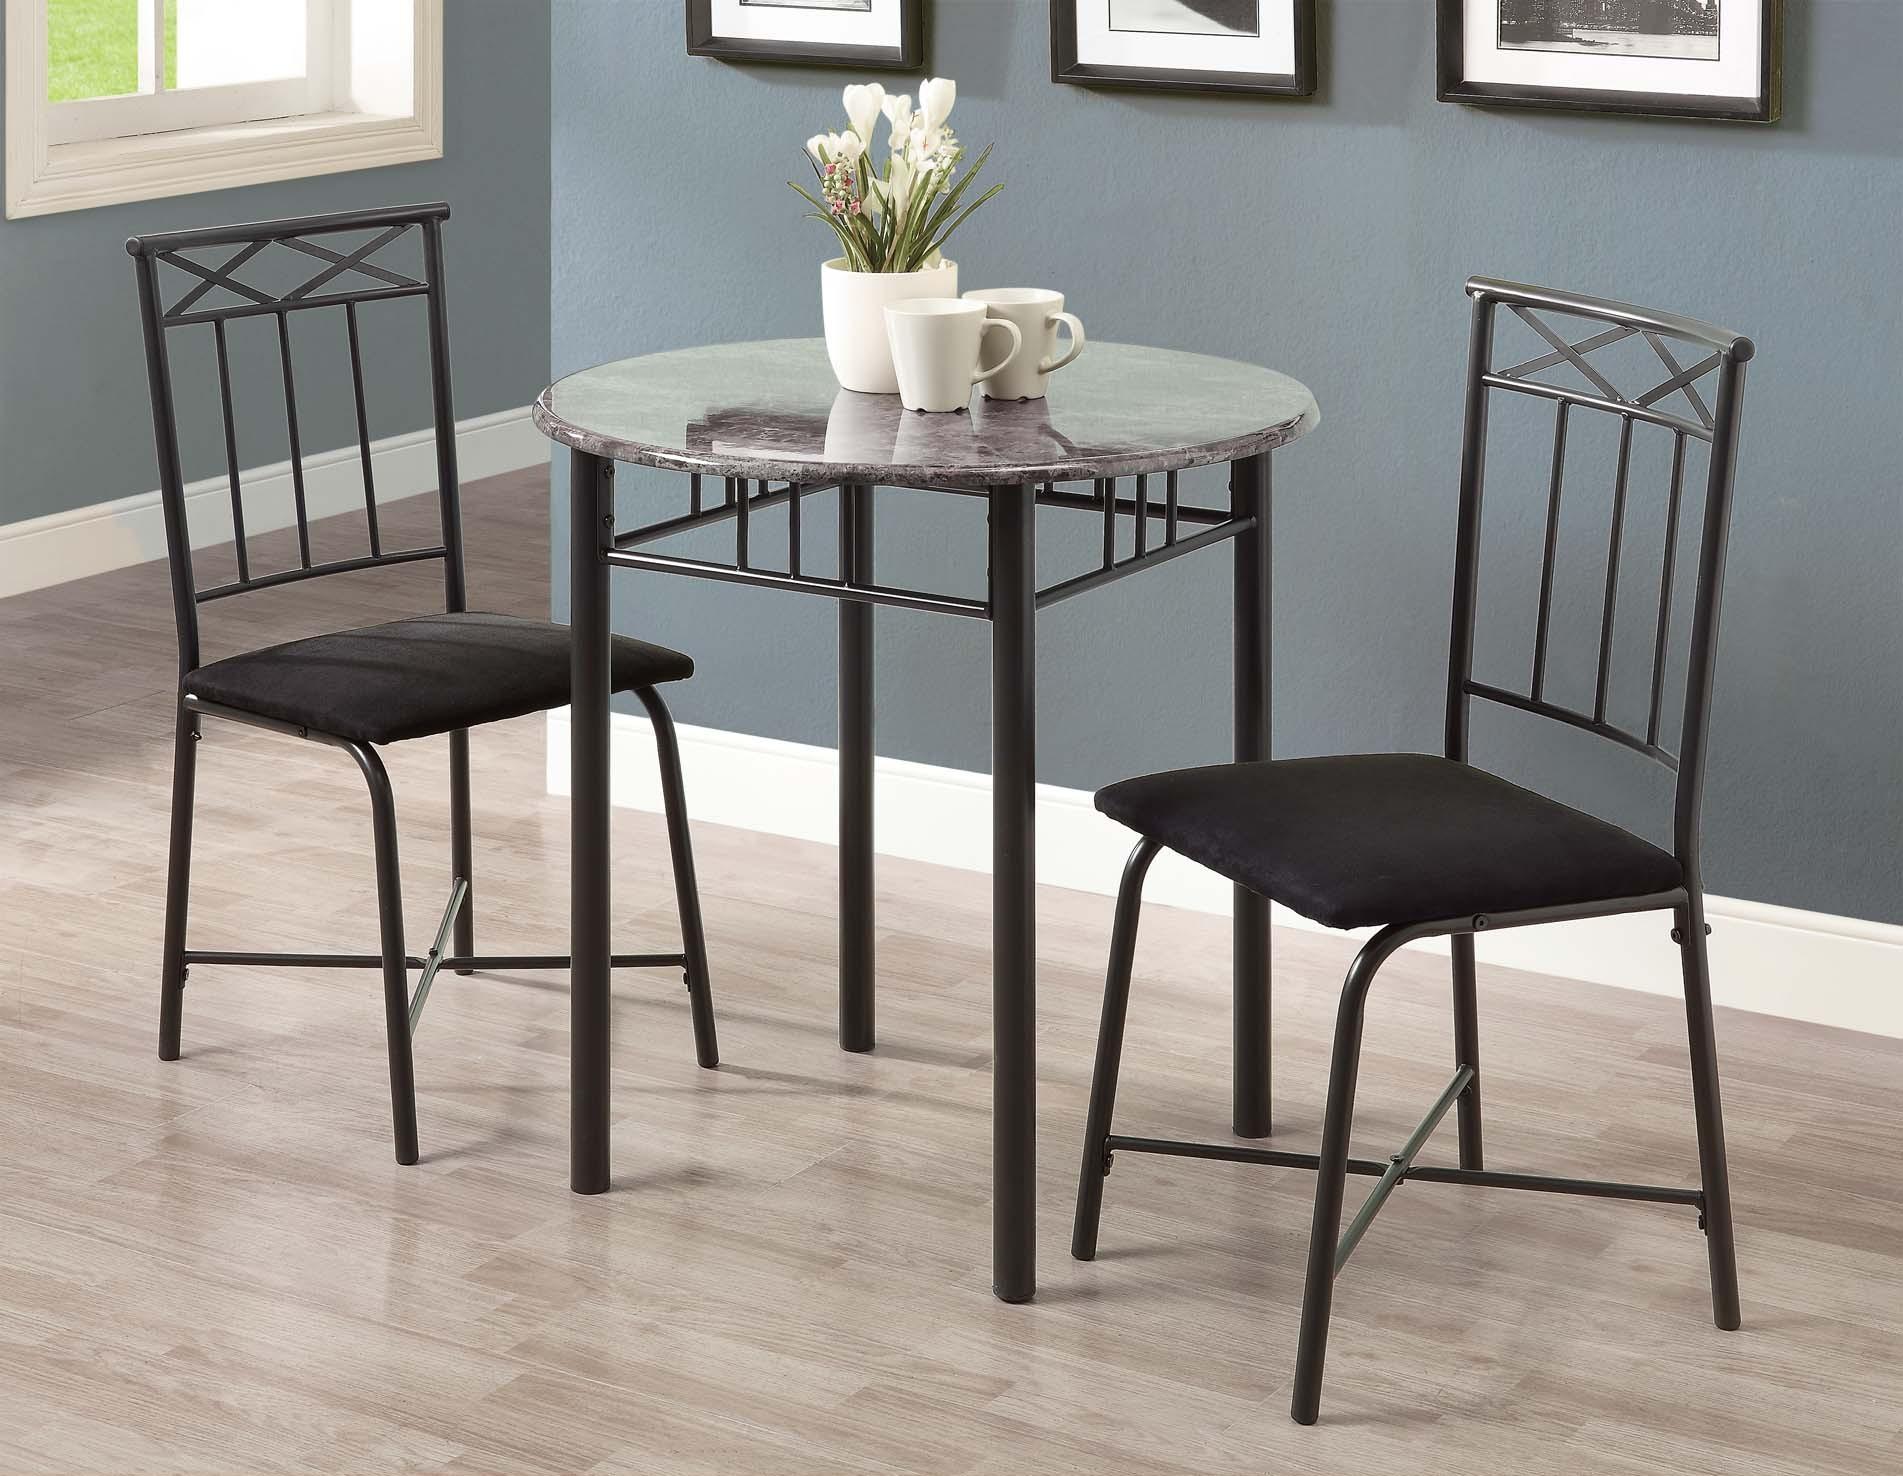 3065 grey marble charcoal metal 3pcs bistro set from monarch i 3065 coleman furniture. Black Bedroom Furniture Sets. Home Design Ideas